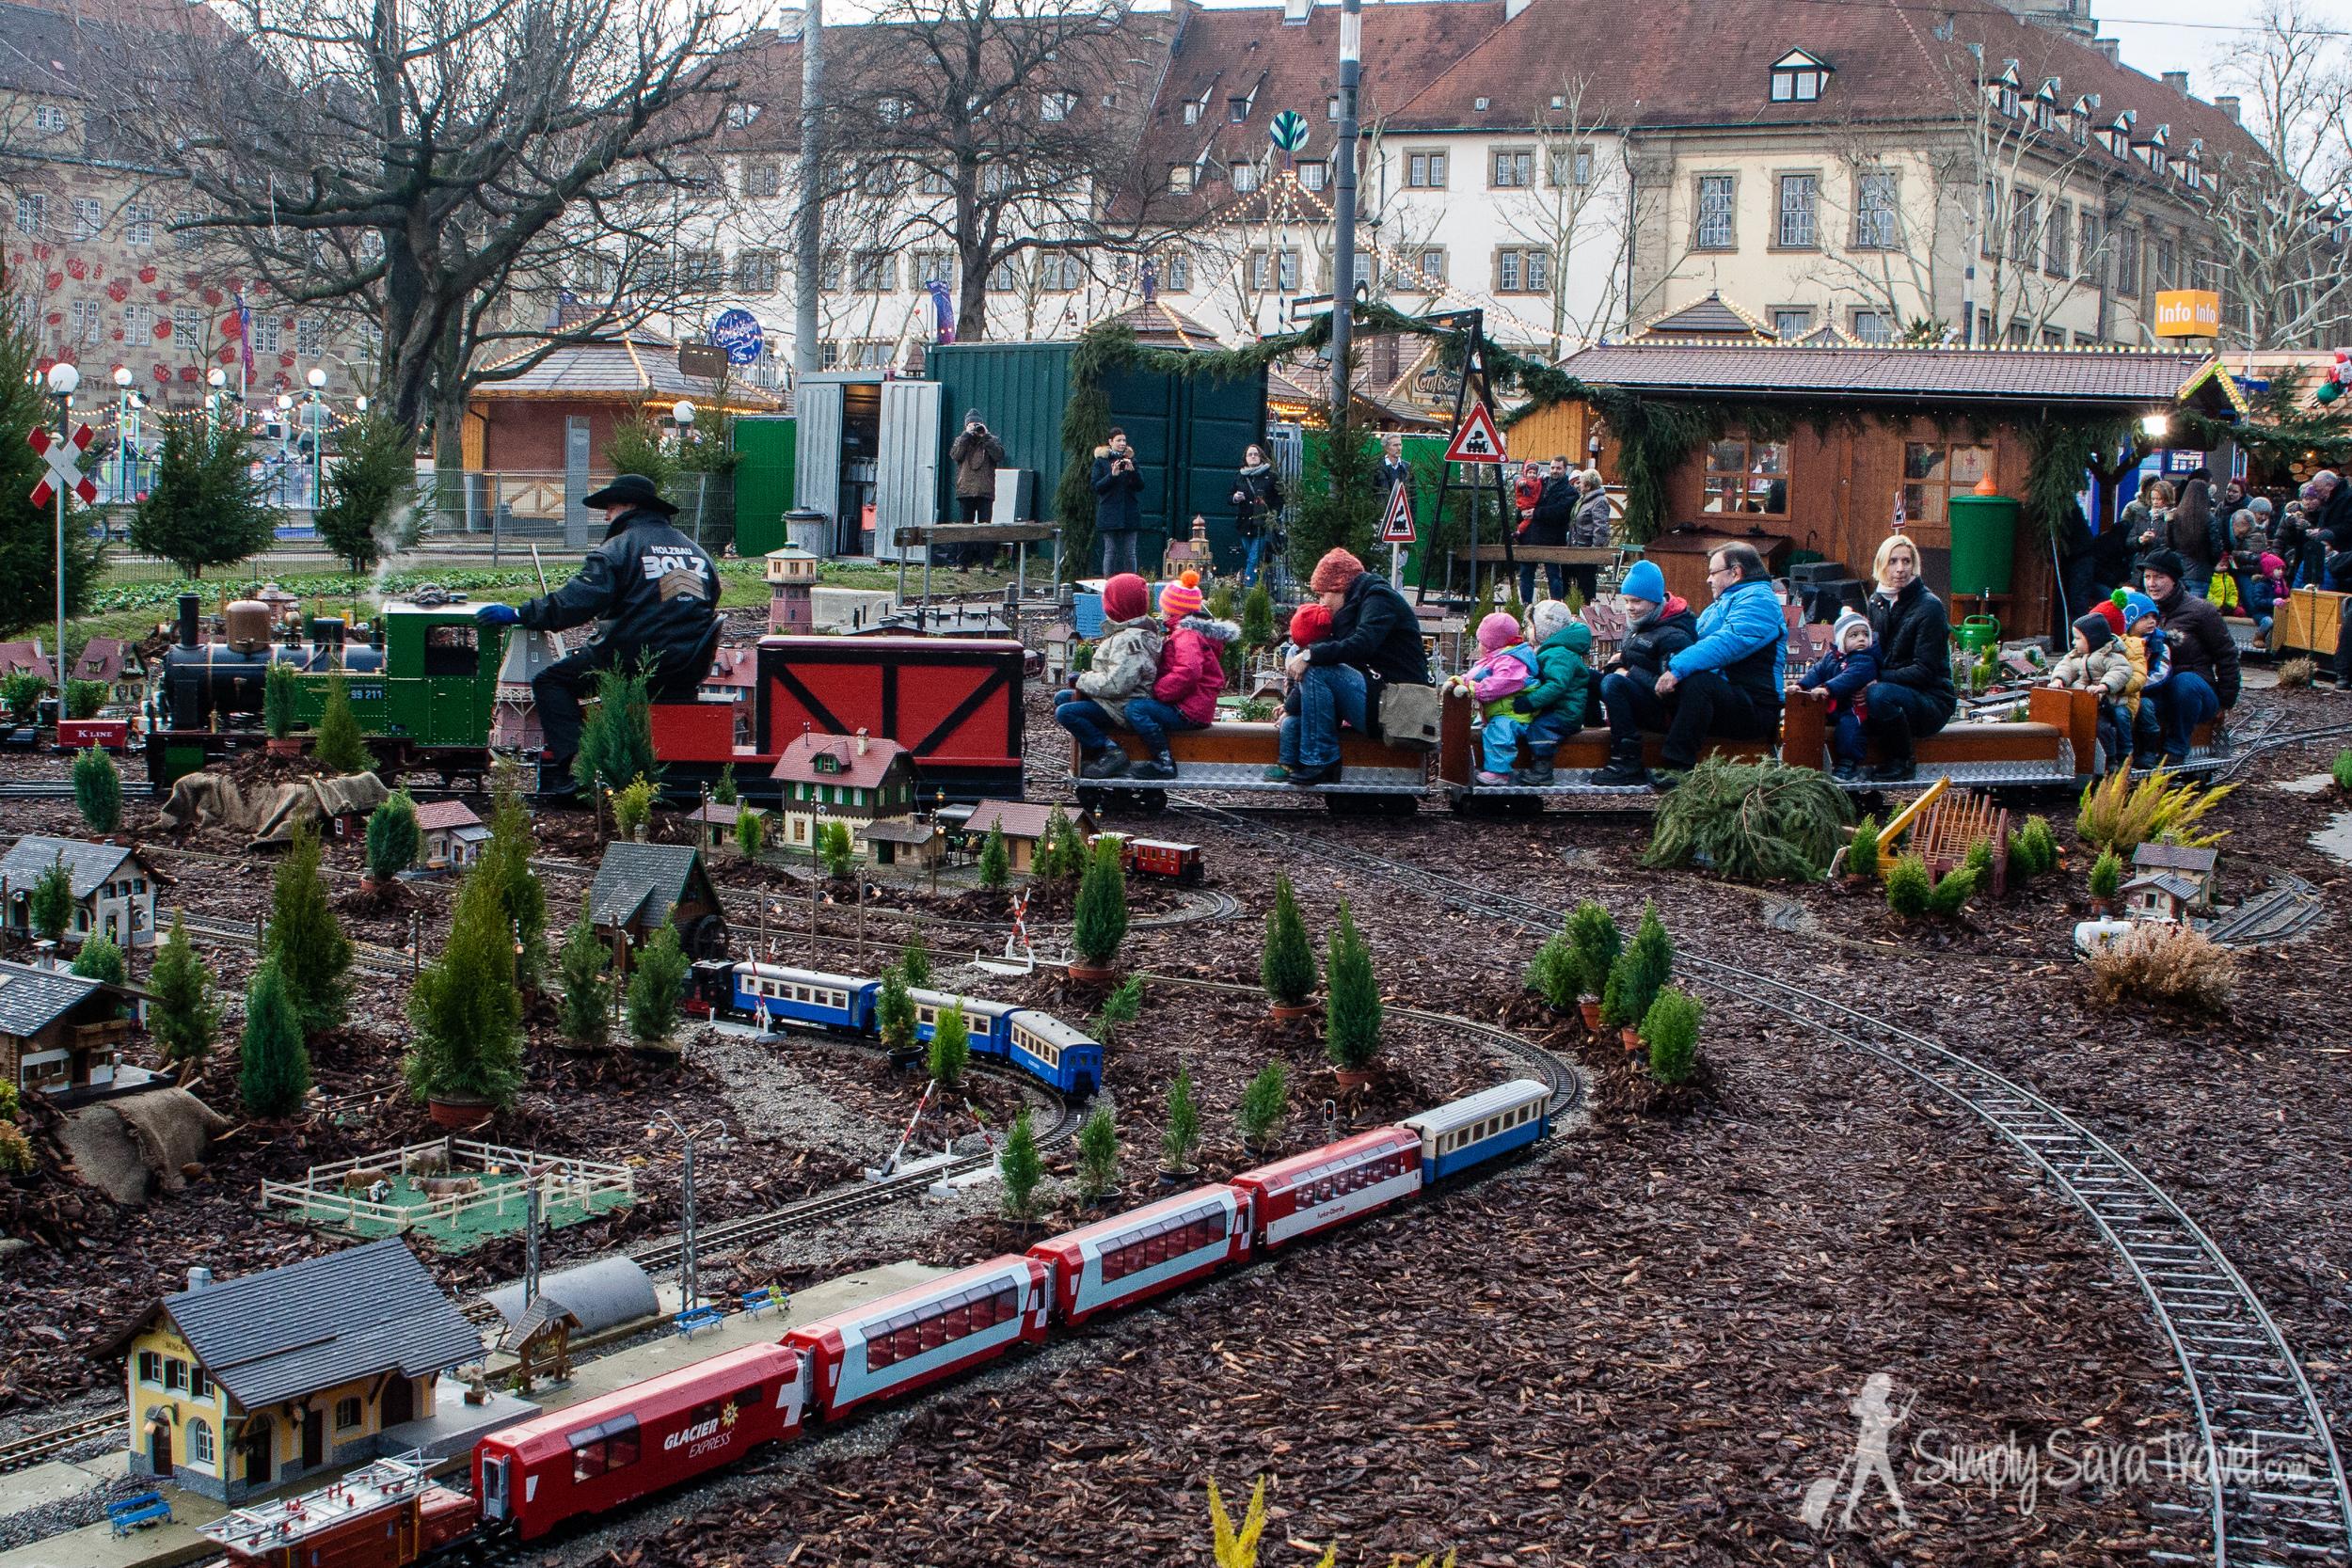 All aboard at Stuttgart's miniature train ride!